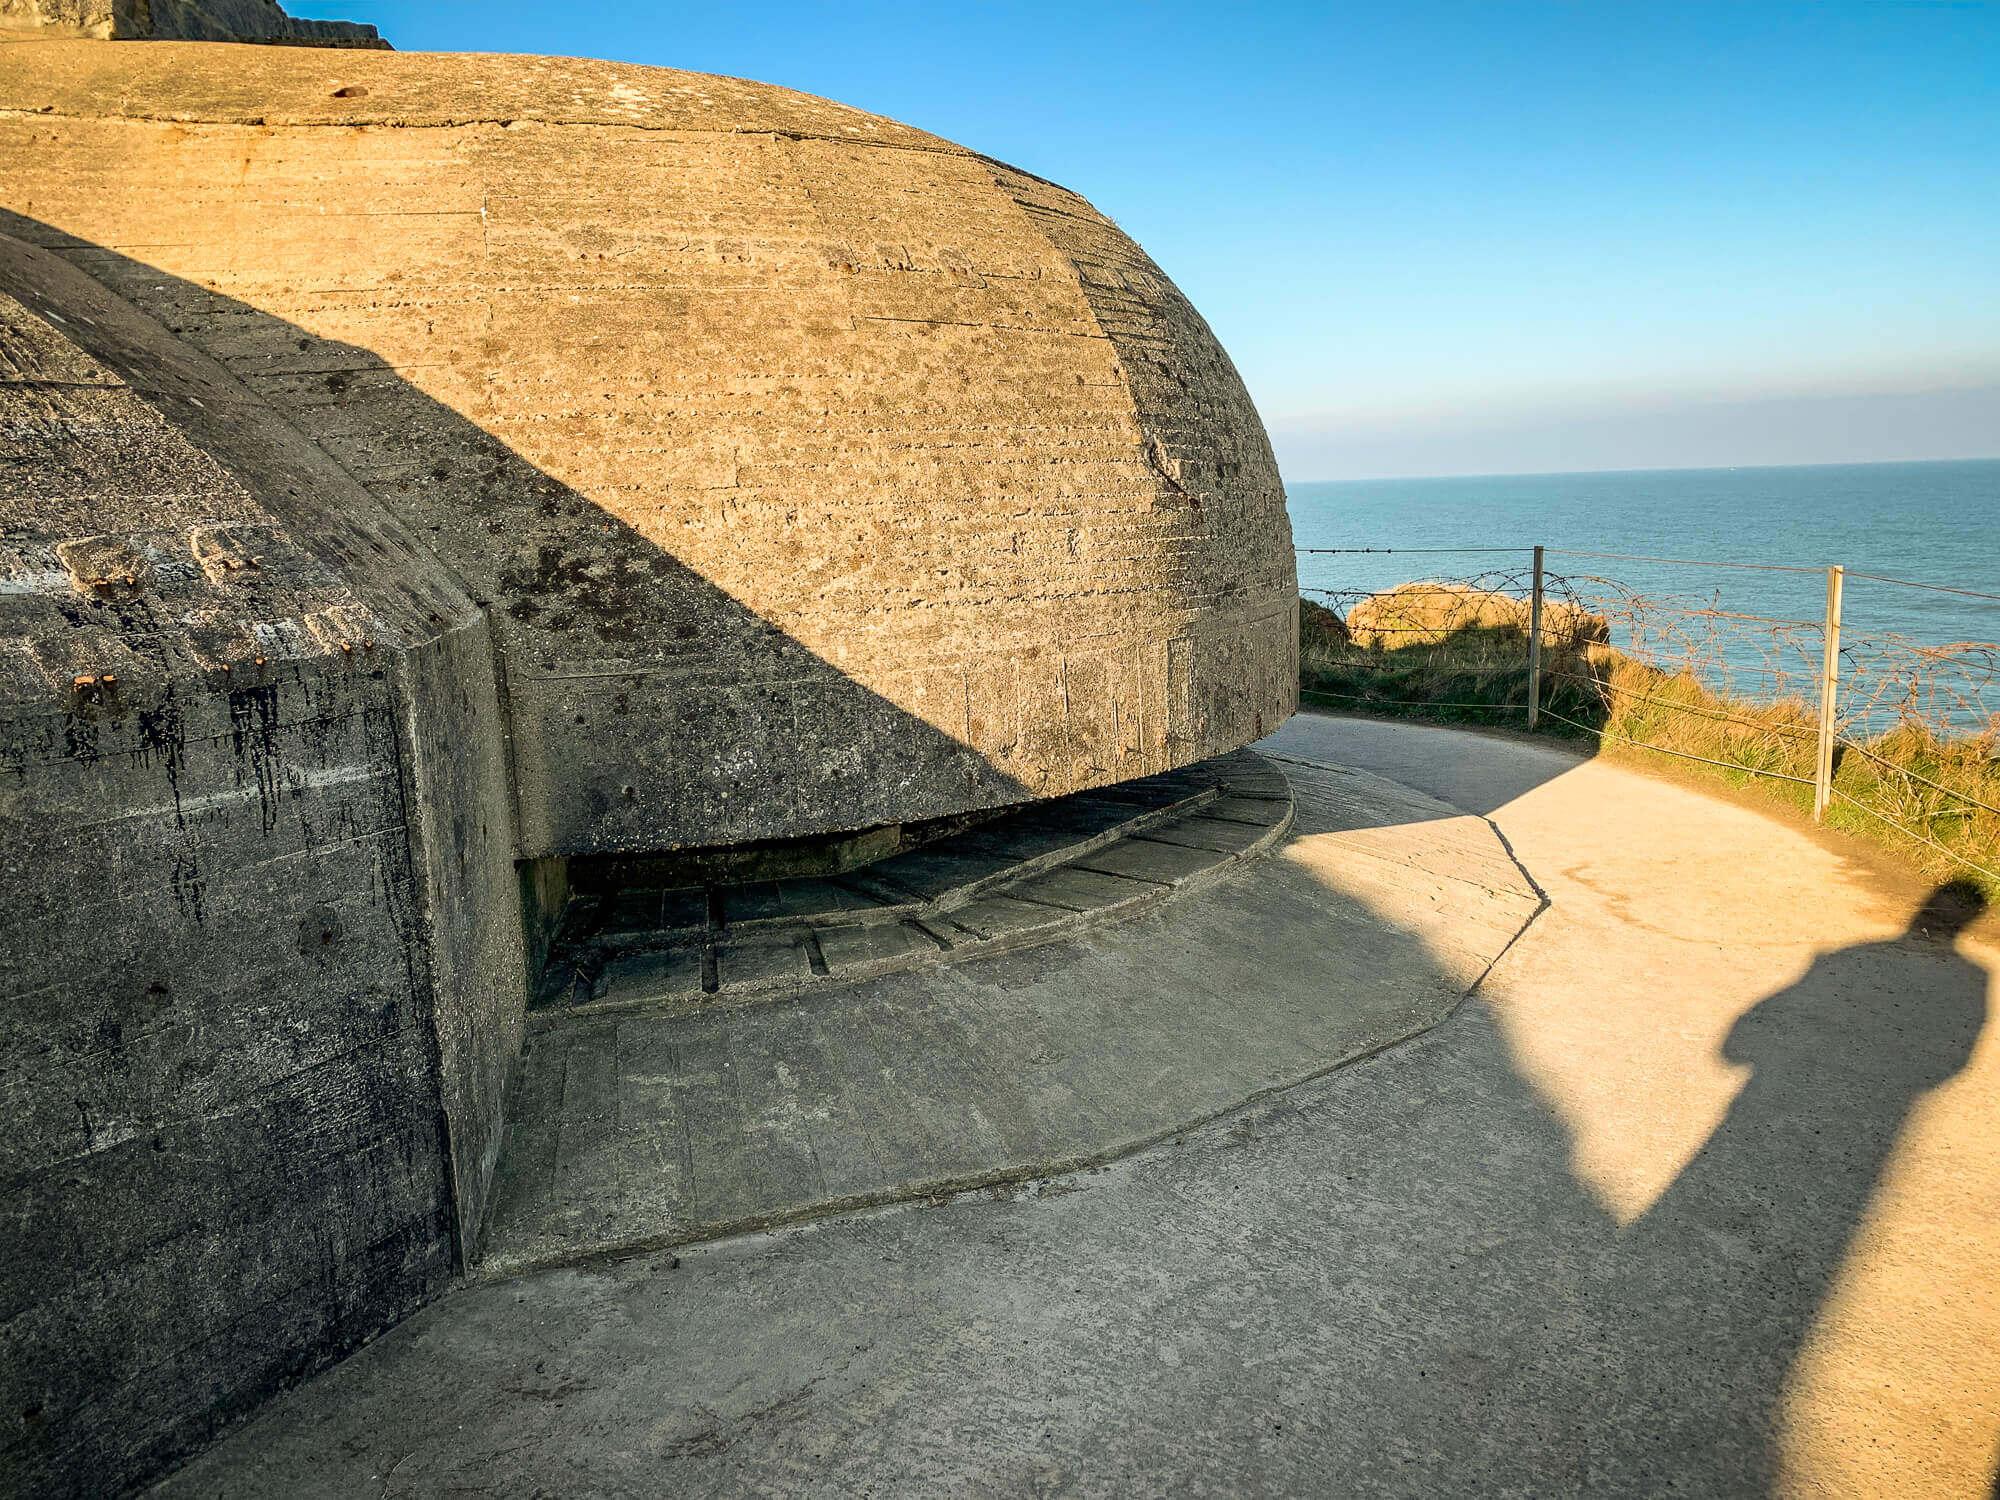 Pointe du Hoc bunker cliff